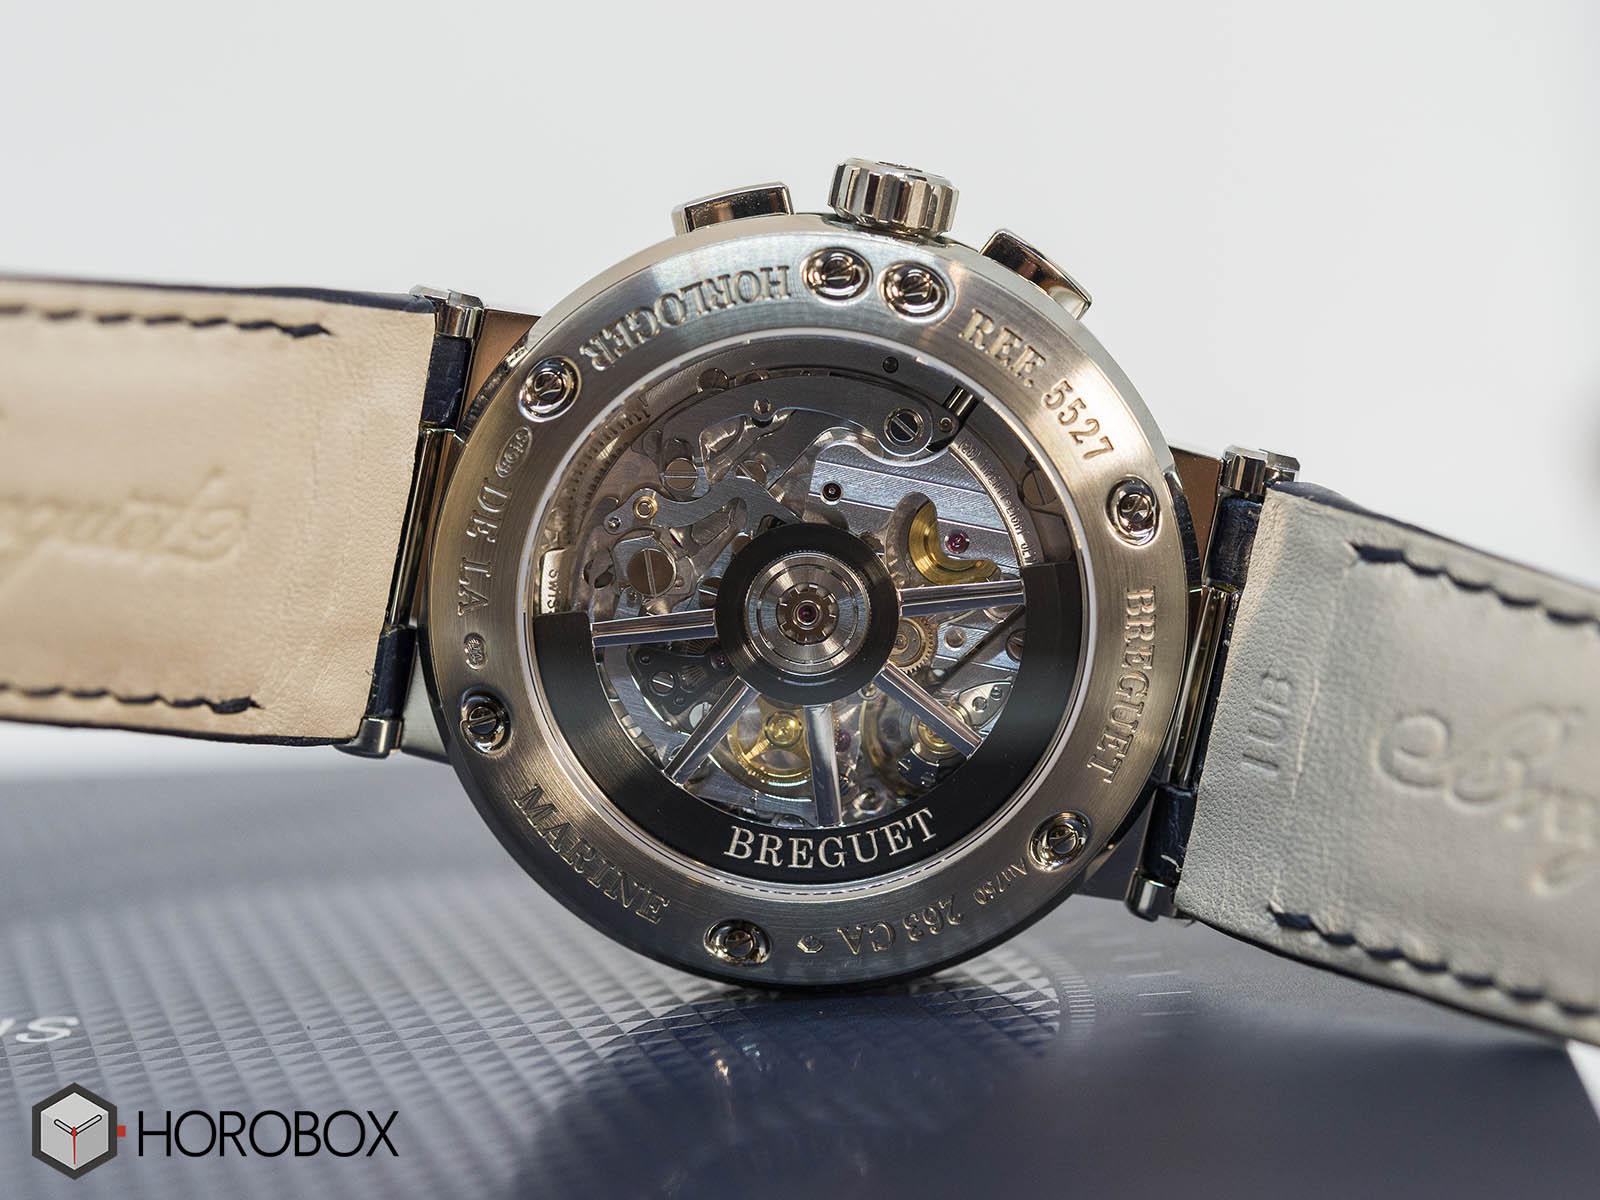 5527-breguet-marine-chronograph-6.jpg